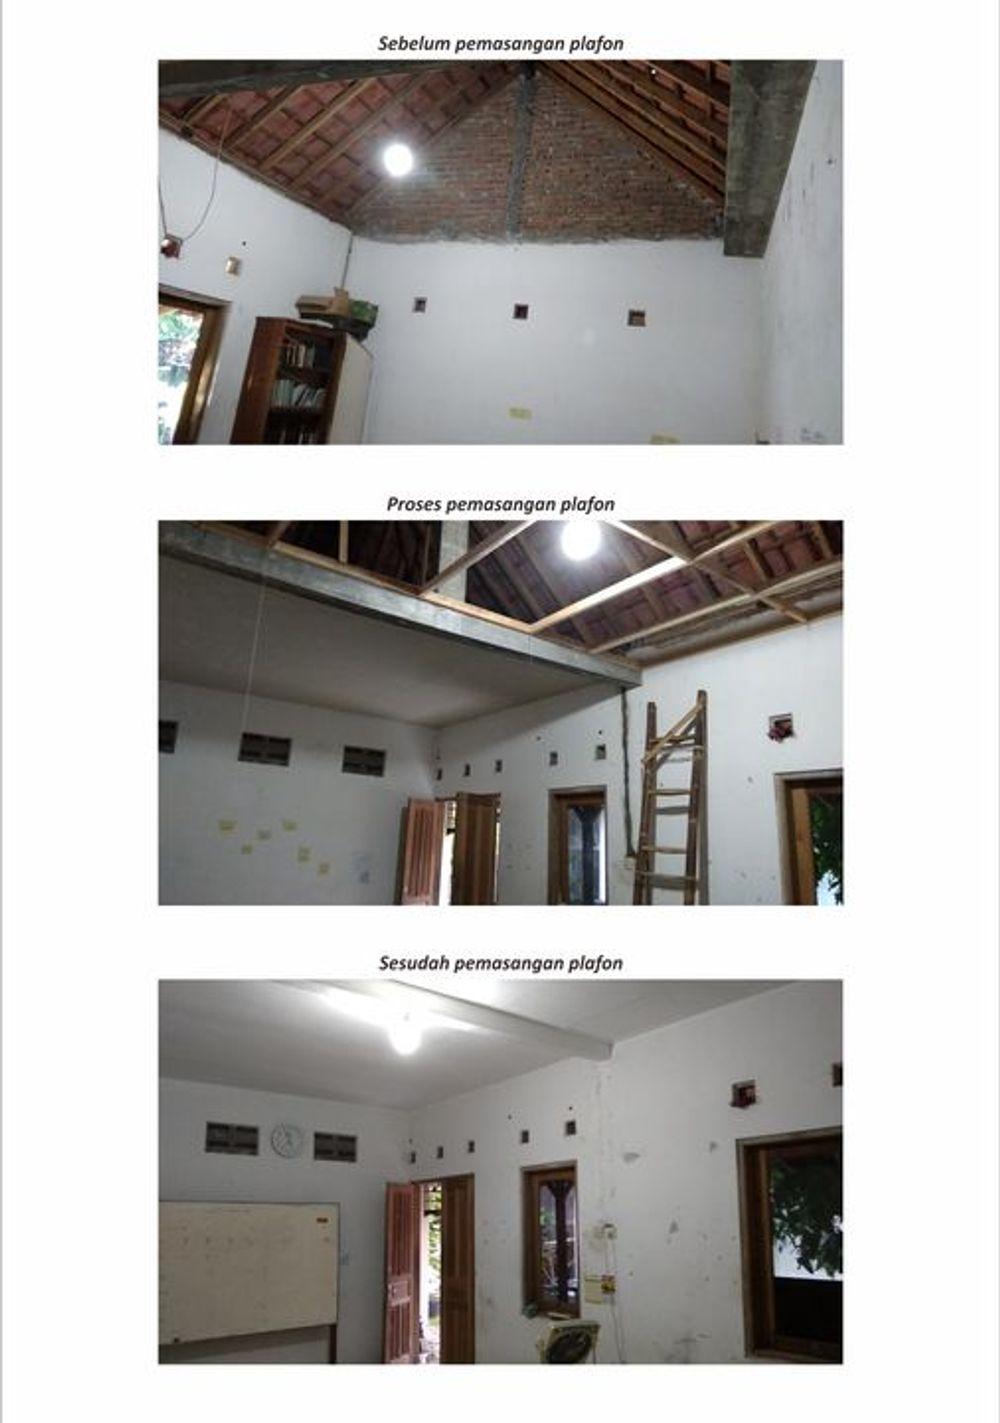 Foto Proses Pemasangan Plafon